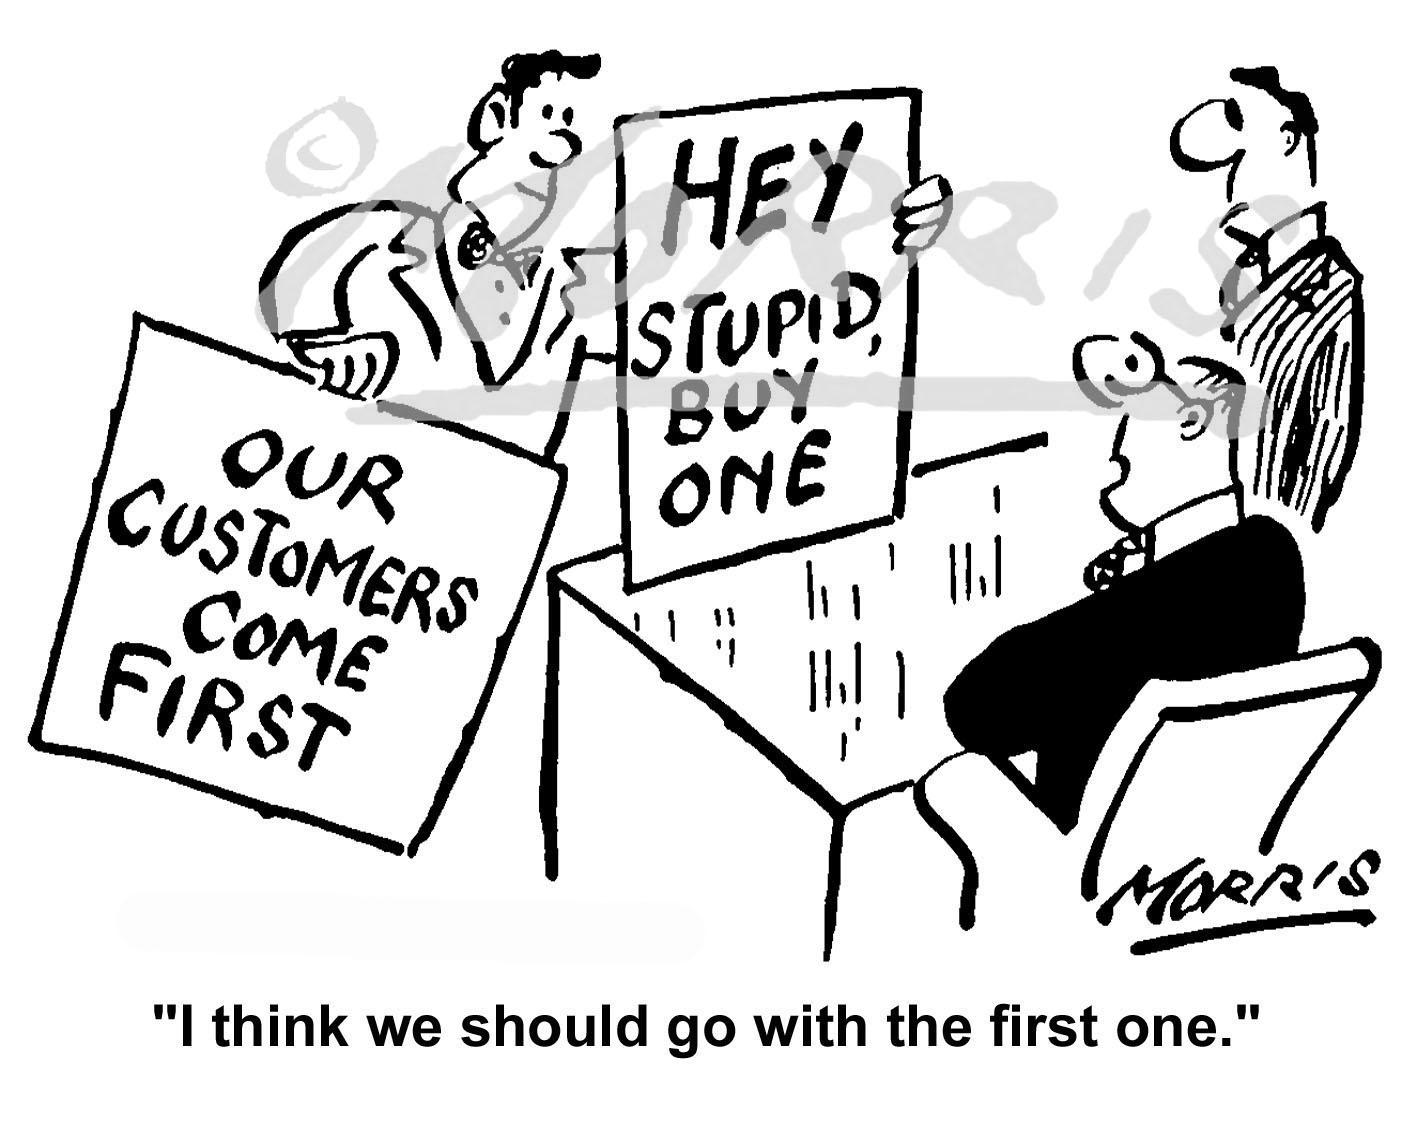 Advertising business cartoon Ref: 1683bw